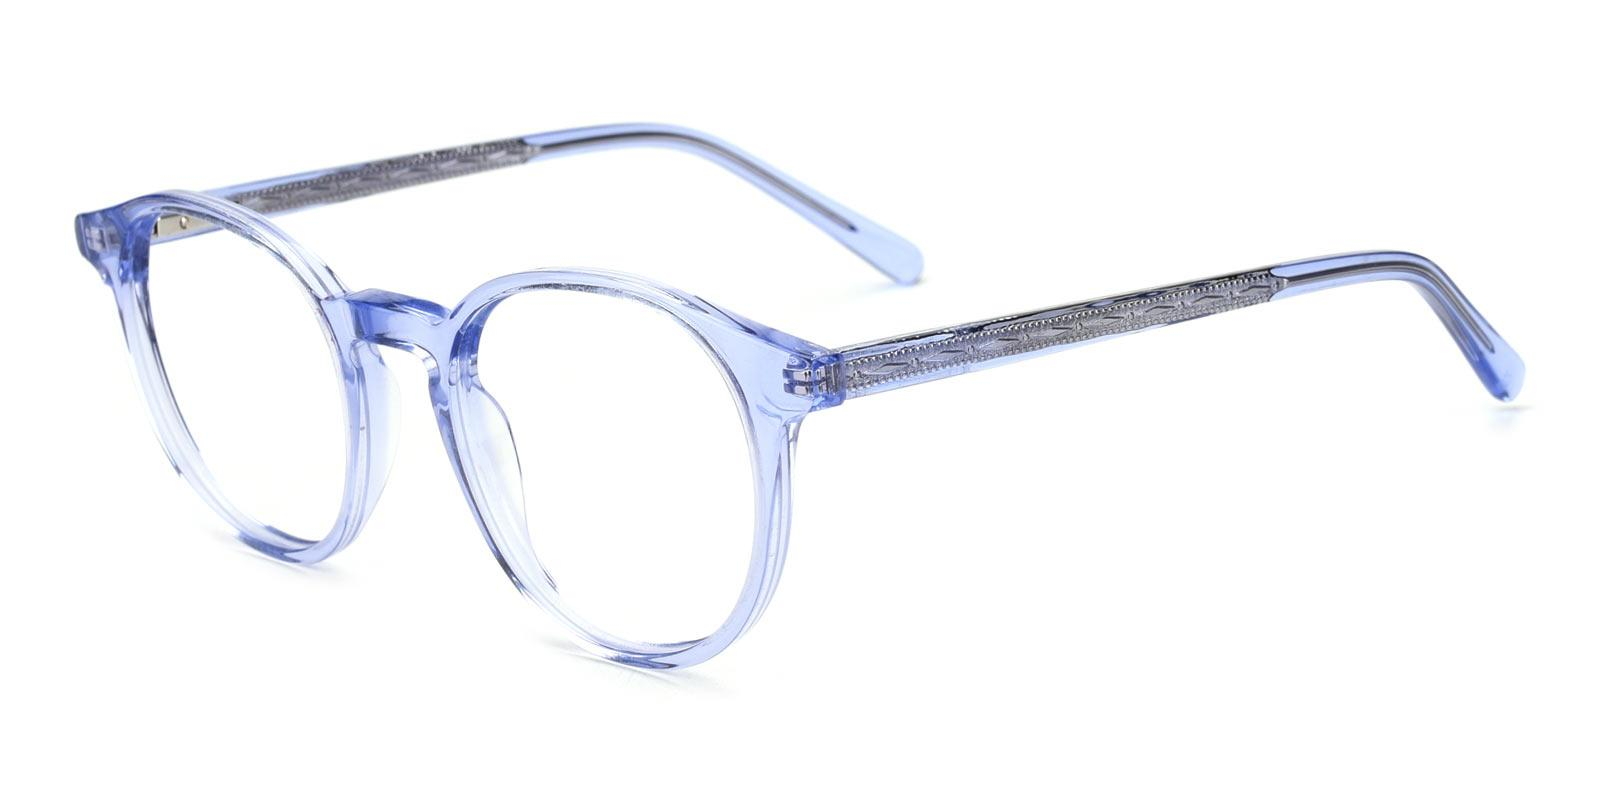 Angie-Blue-Round-Acetate-Eyeglasses-detail